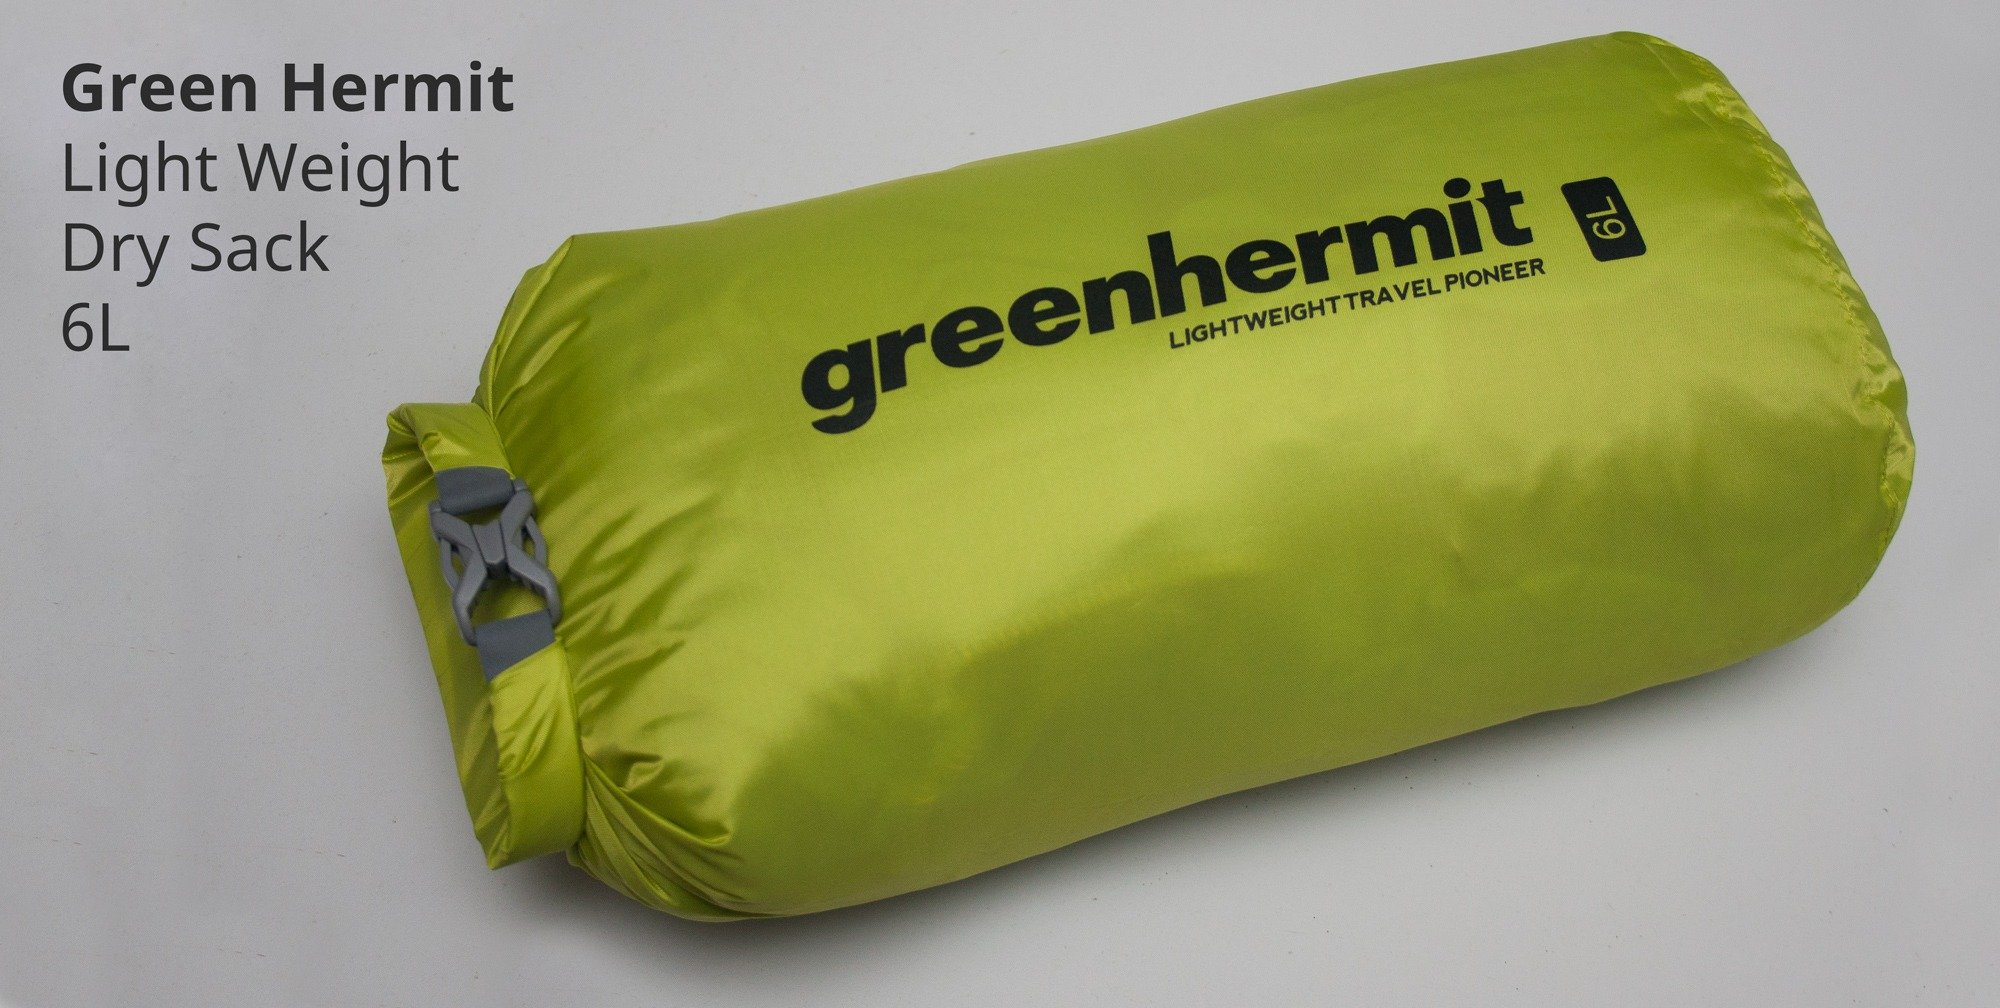 Green Hermit Lightweight Dry Sack 6L